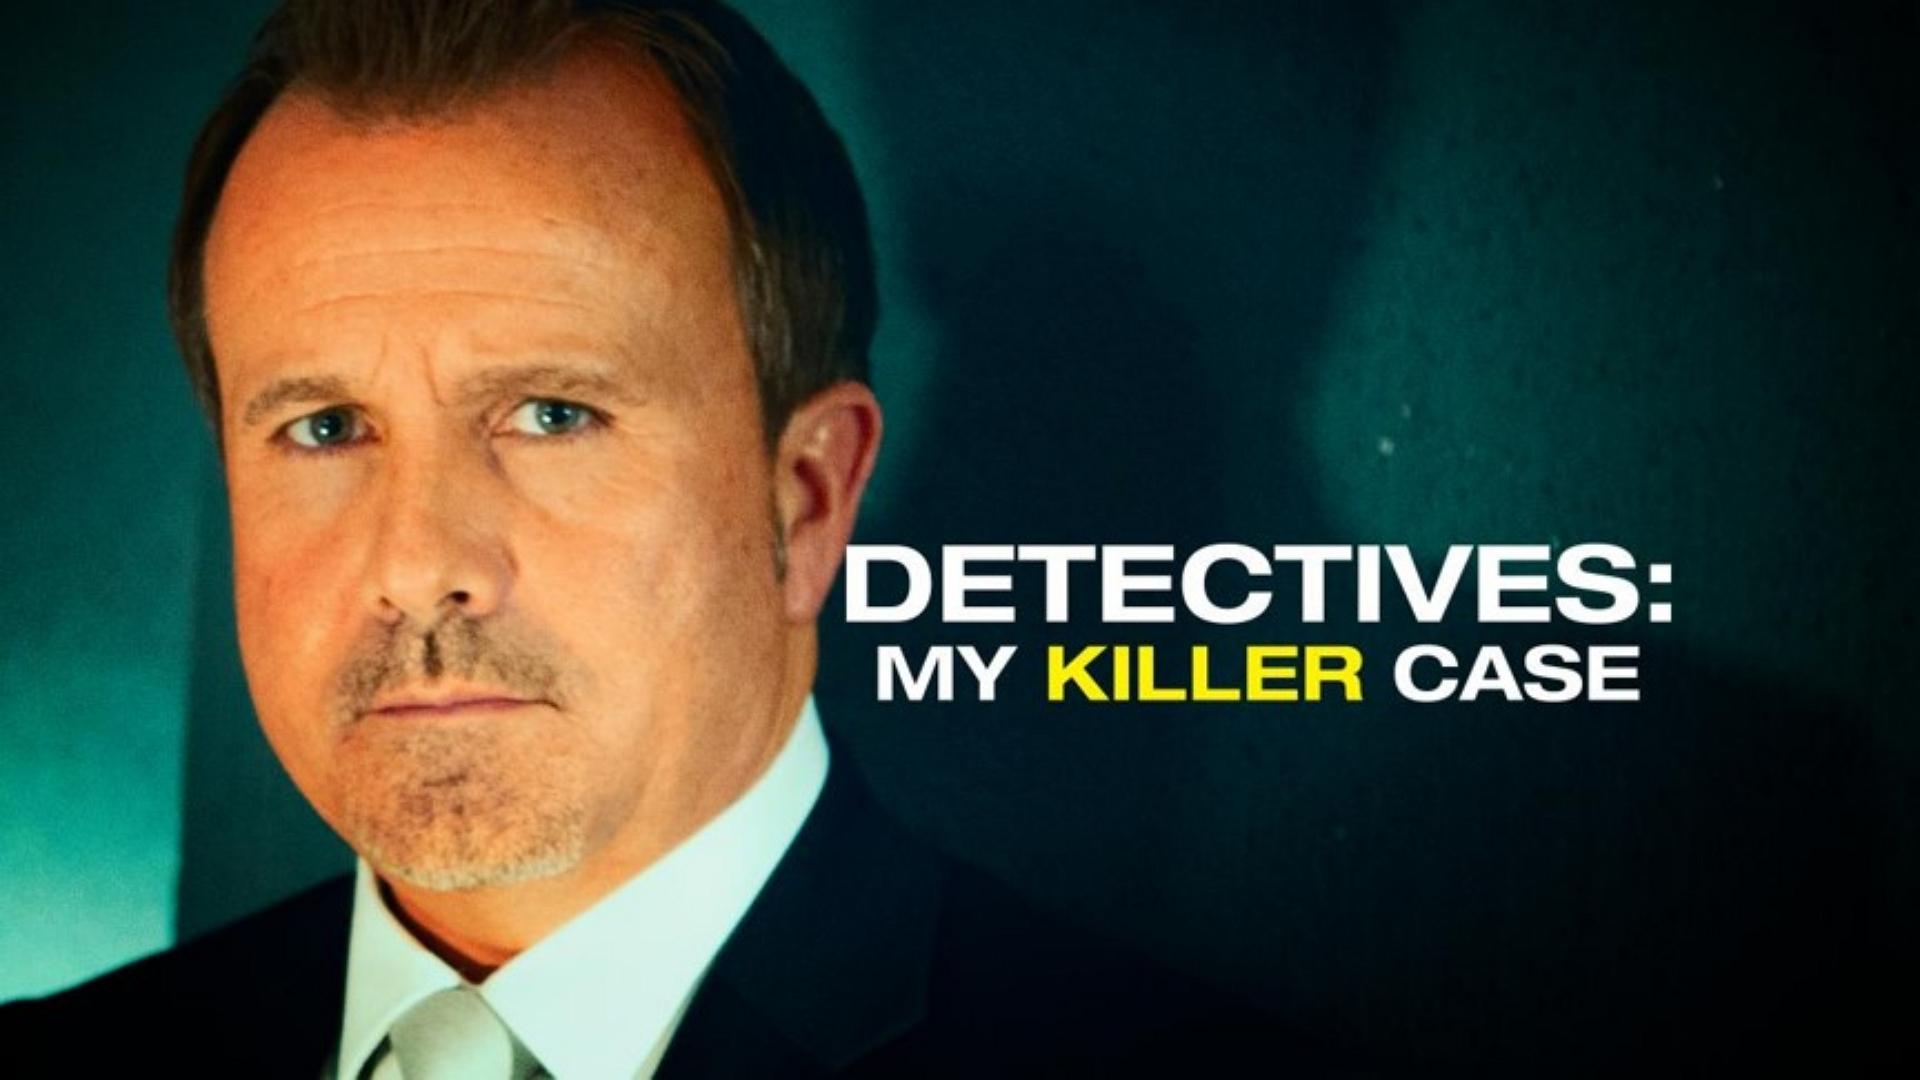 Detectives: My Killer Case